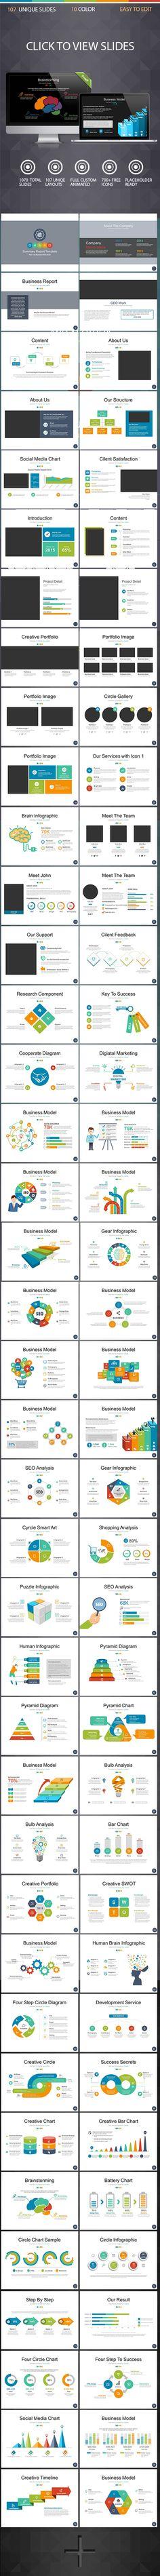 Webinar Request PowerPoint Template | Template, Business powerpoint ...